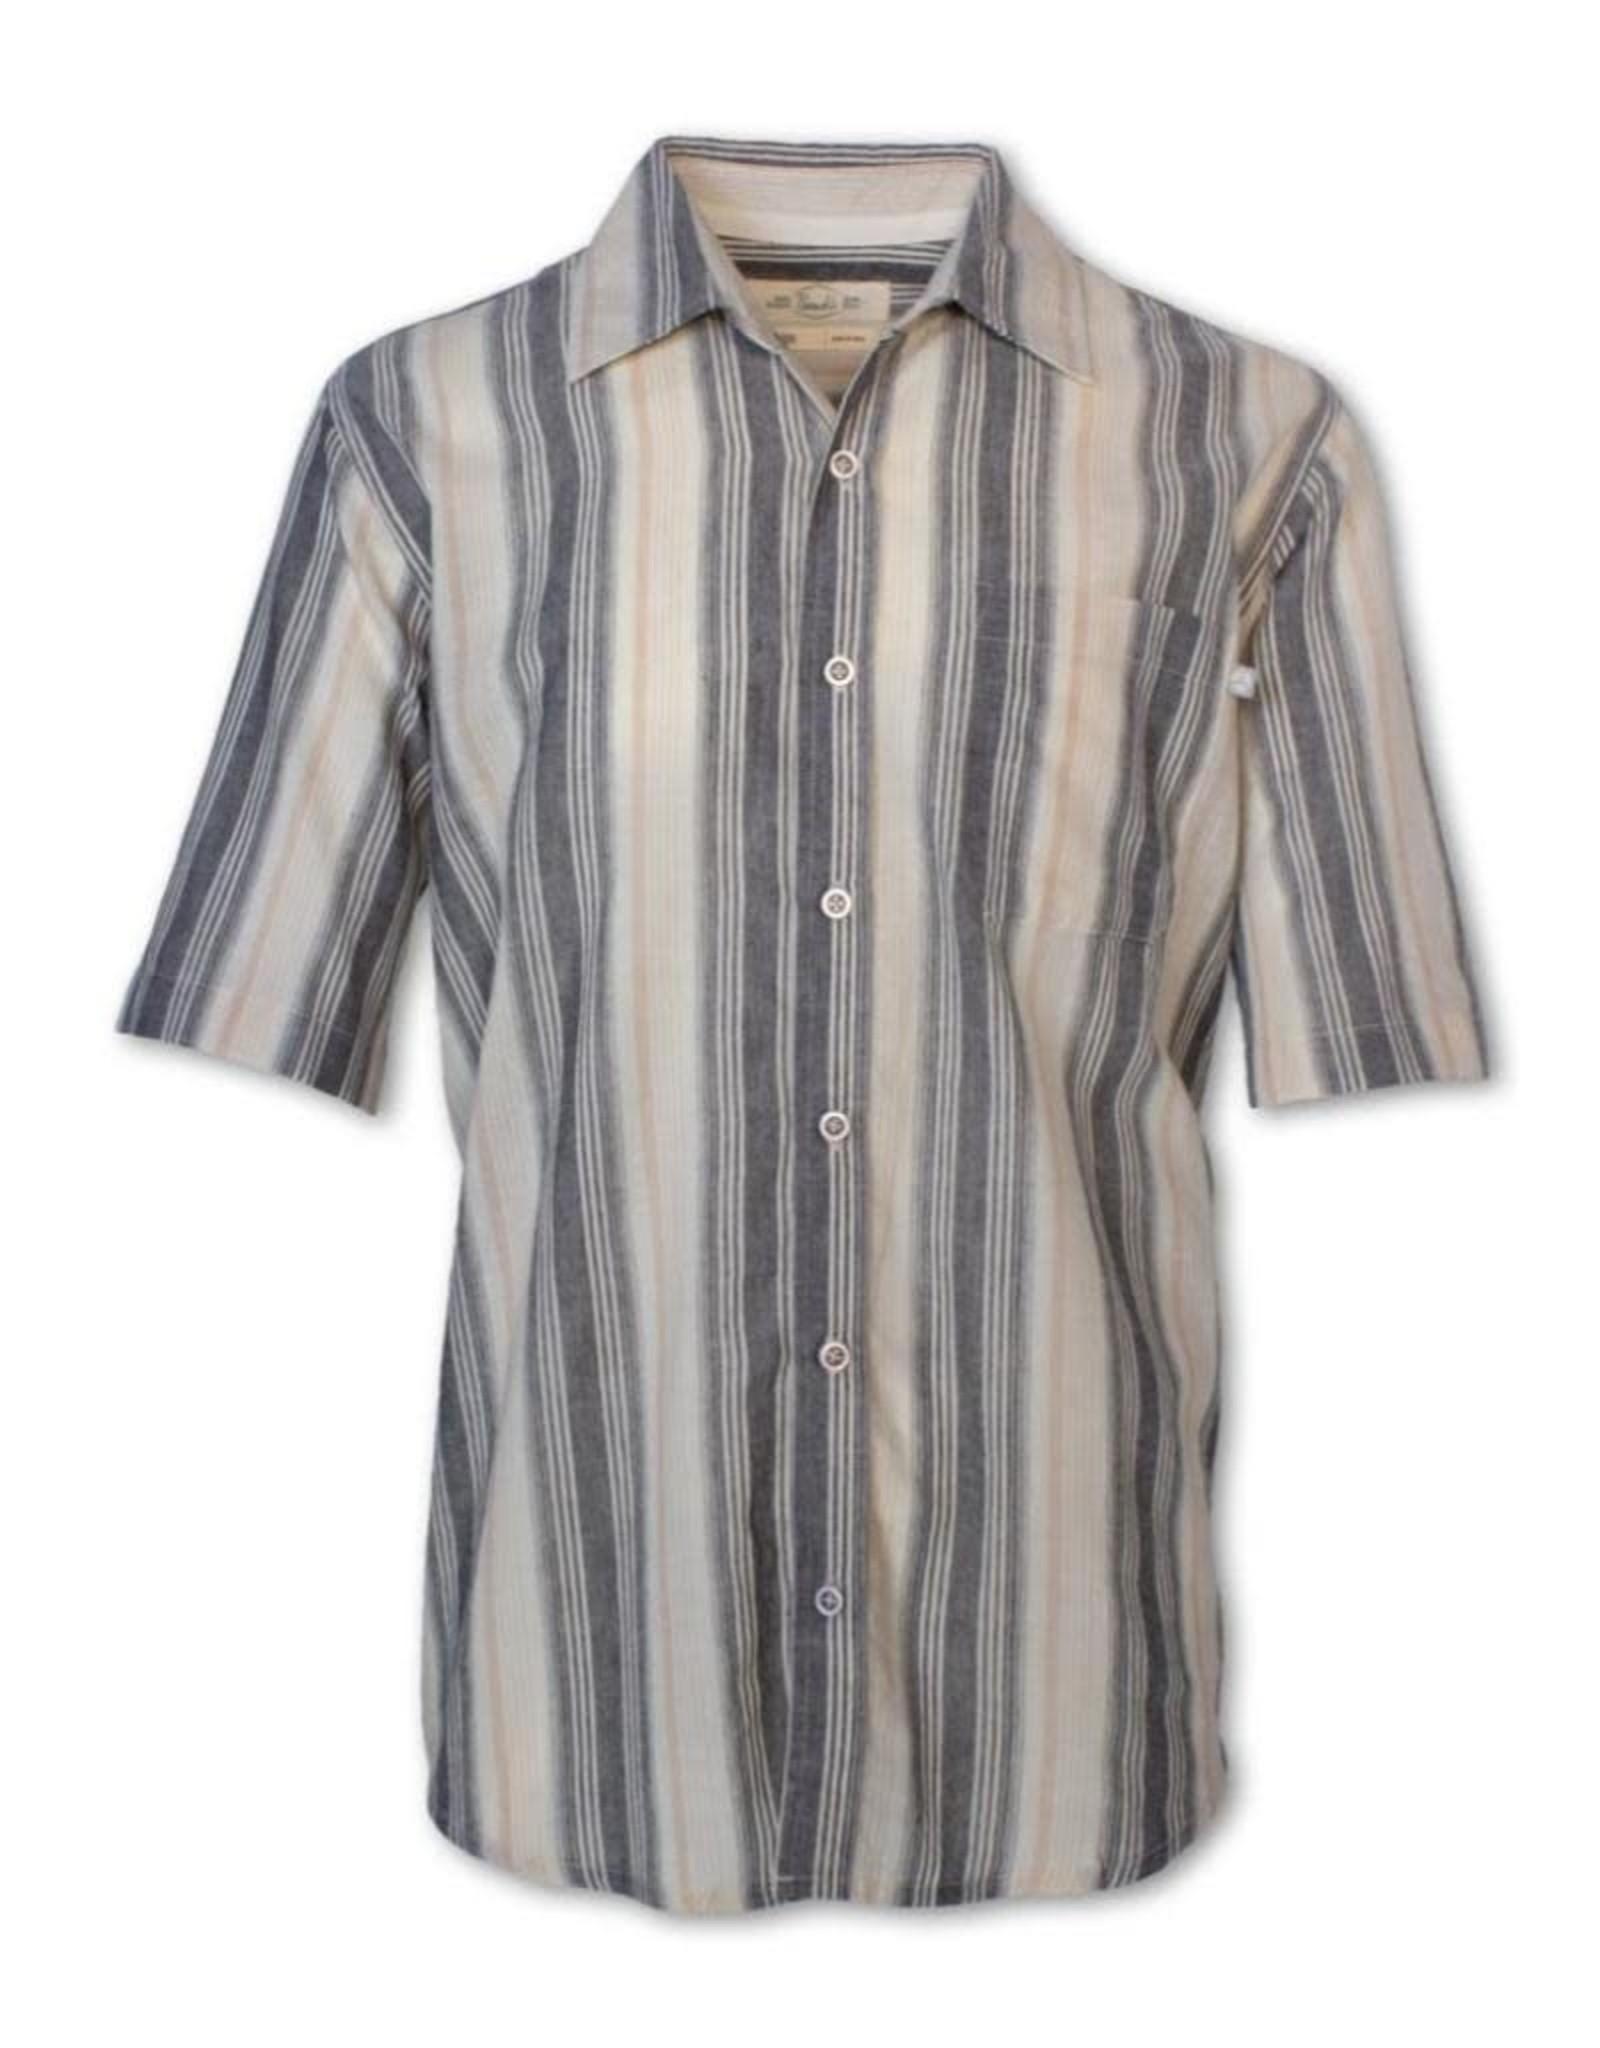 Purnell Men's Vintage Madras Shirt